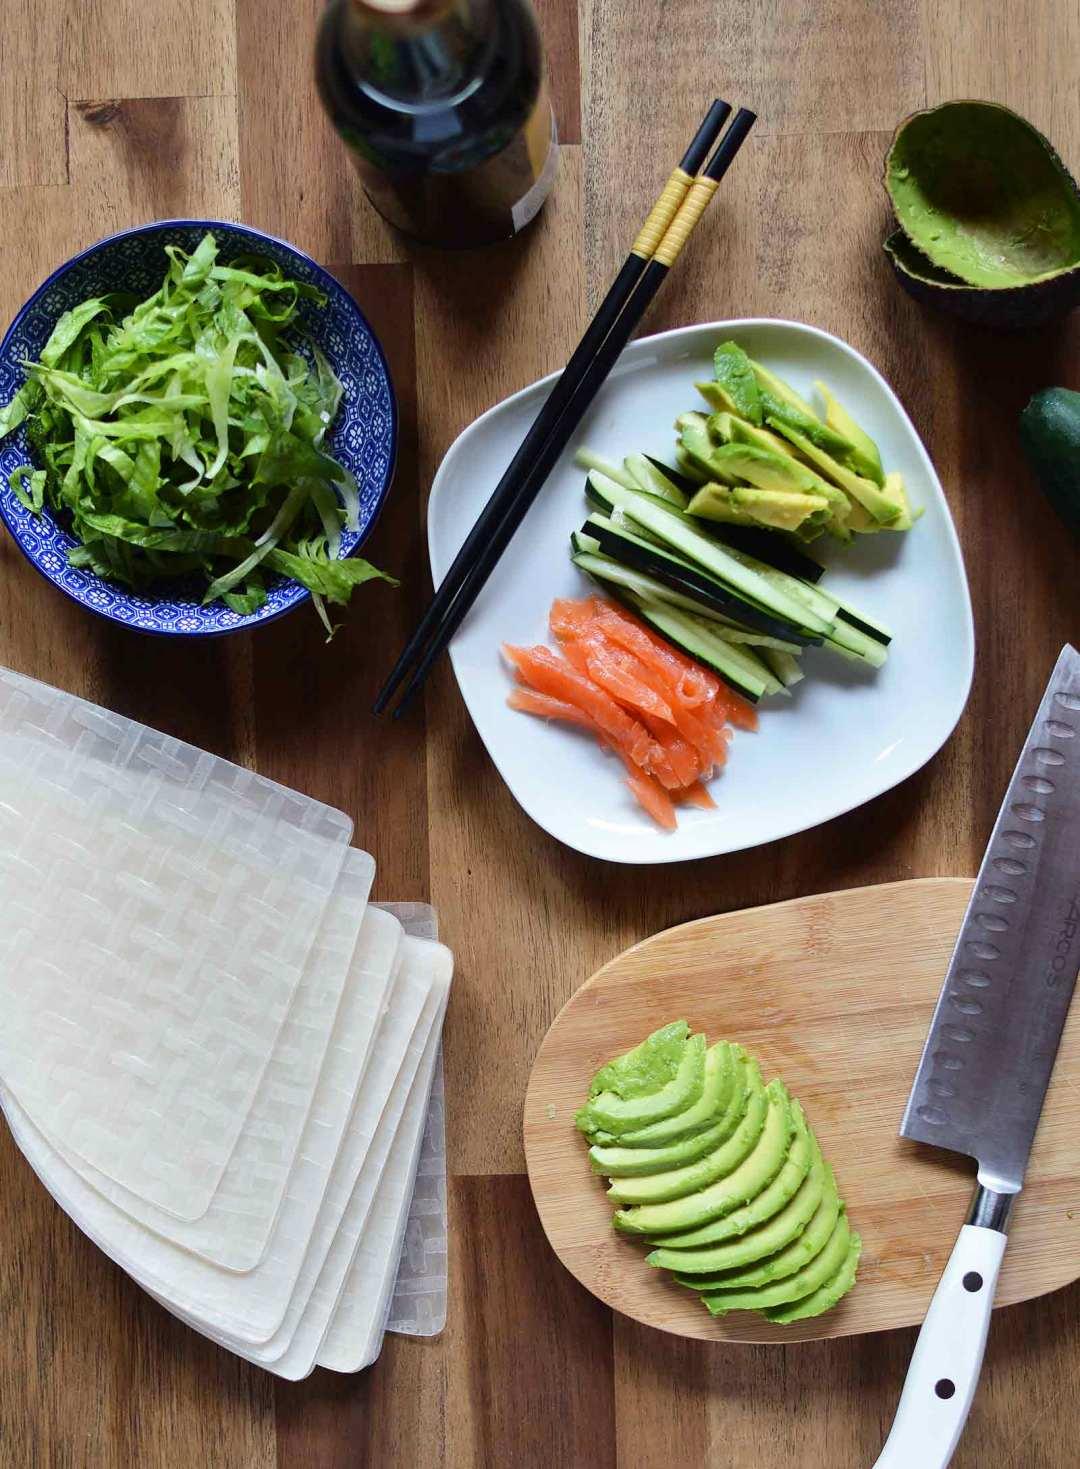 Ingredientes para los rollitos vietnamitas